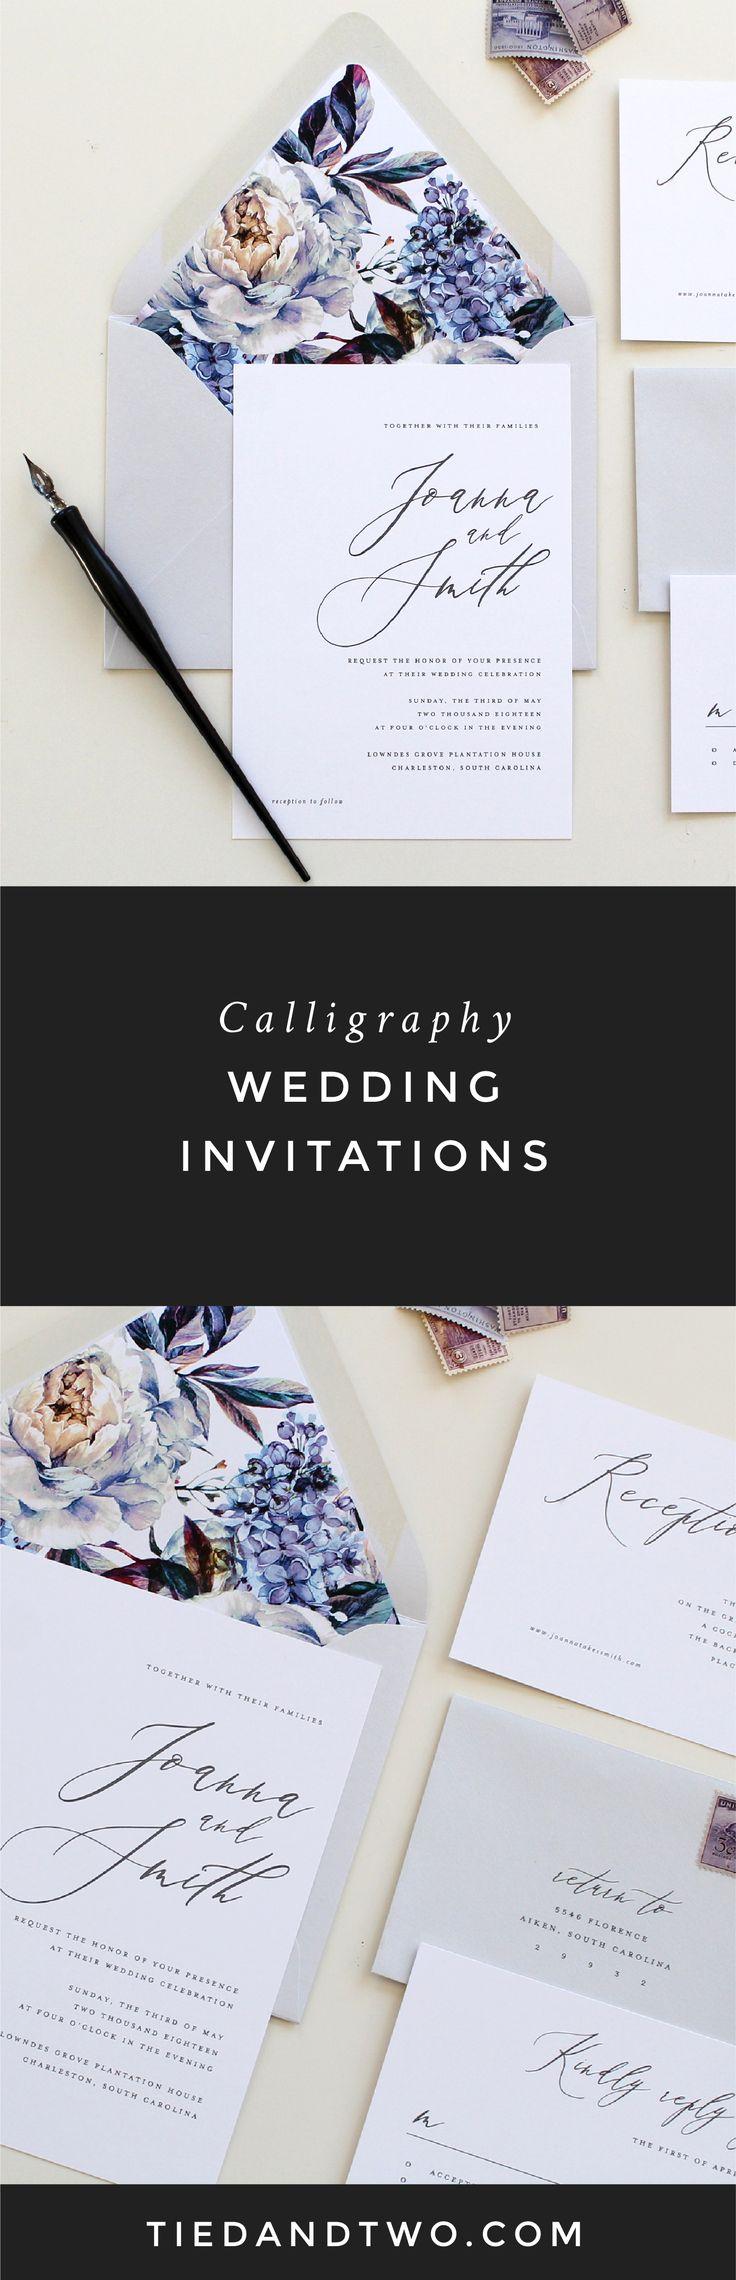 diamond wedding invitations%0A Purple Calligraphy Wedding Invitation   Modern Calligraphy Wedding Invite   Lilac Modern Wedding Invitation  Lavendar